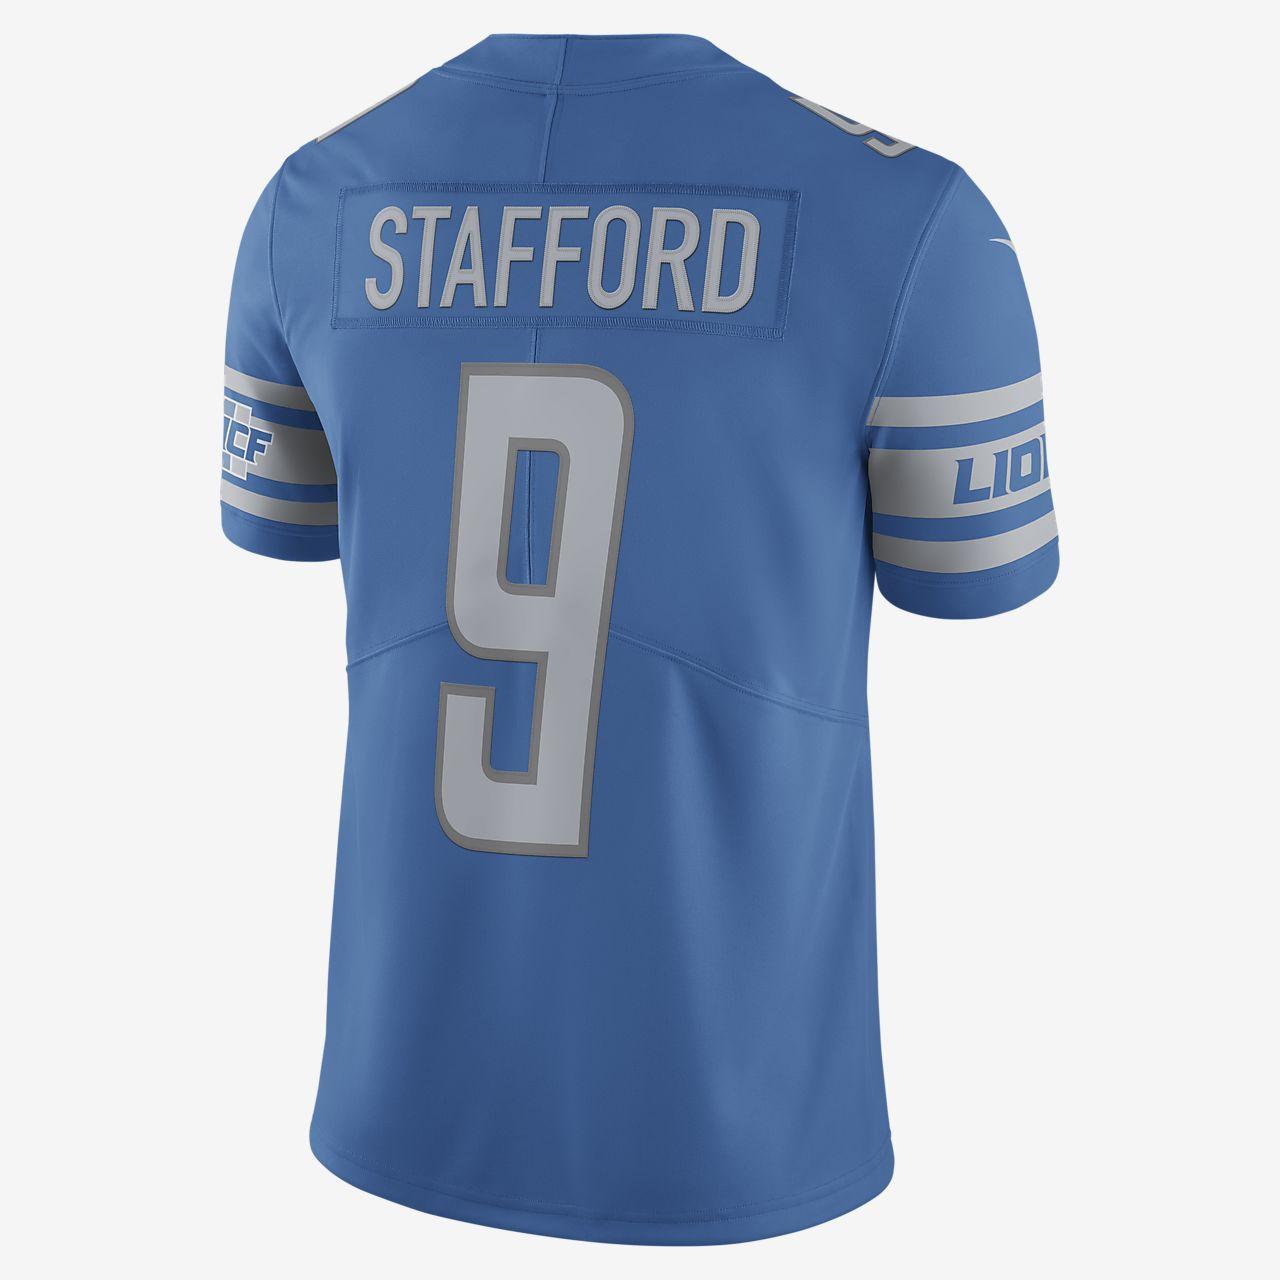 18e1aaf39 ... NFL Detroit Lions (Matthew Stafford) Men's Limited Vapor Untouchable  Football Jersey